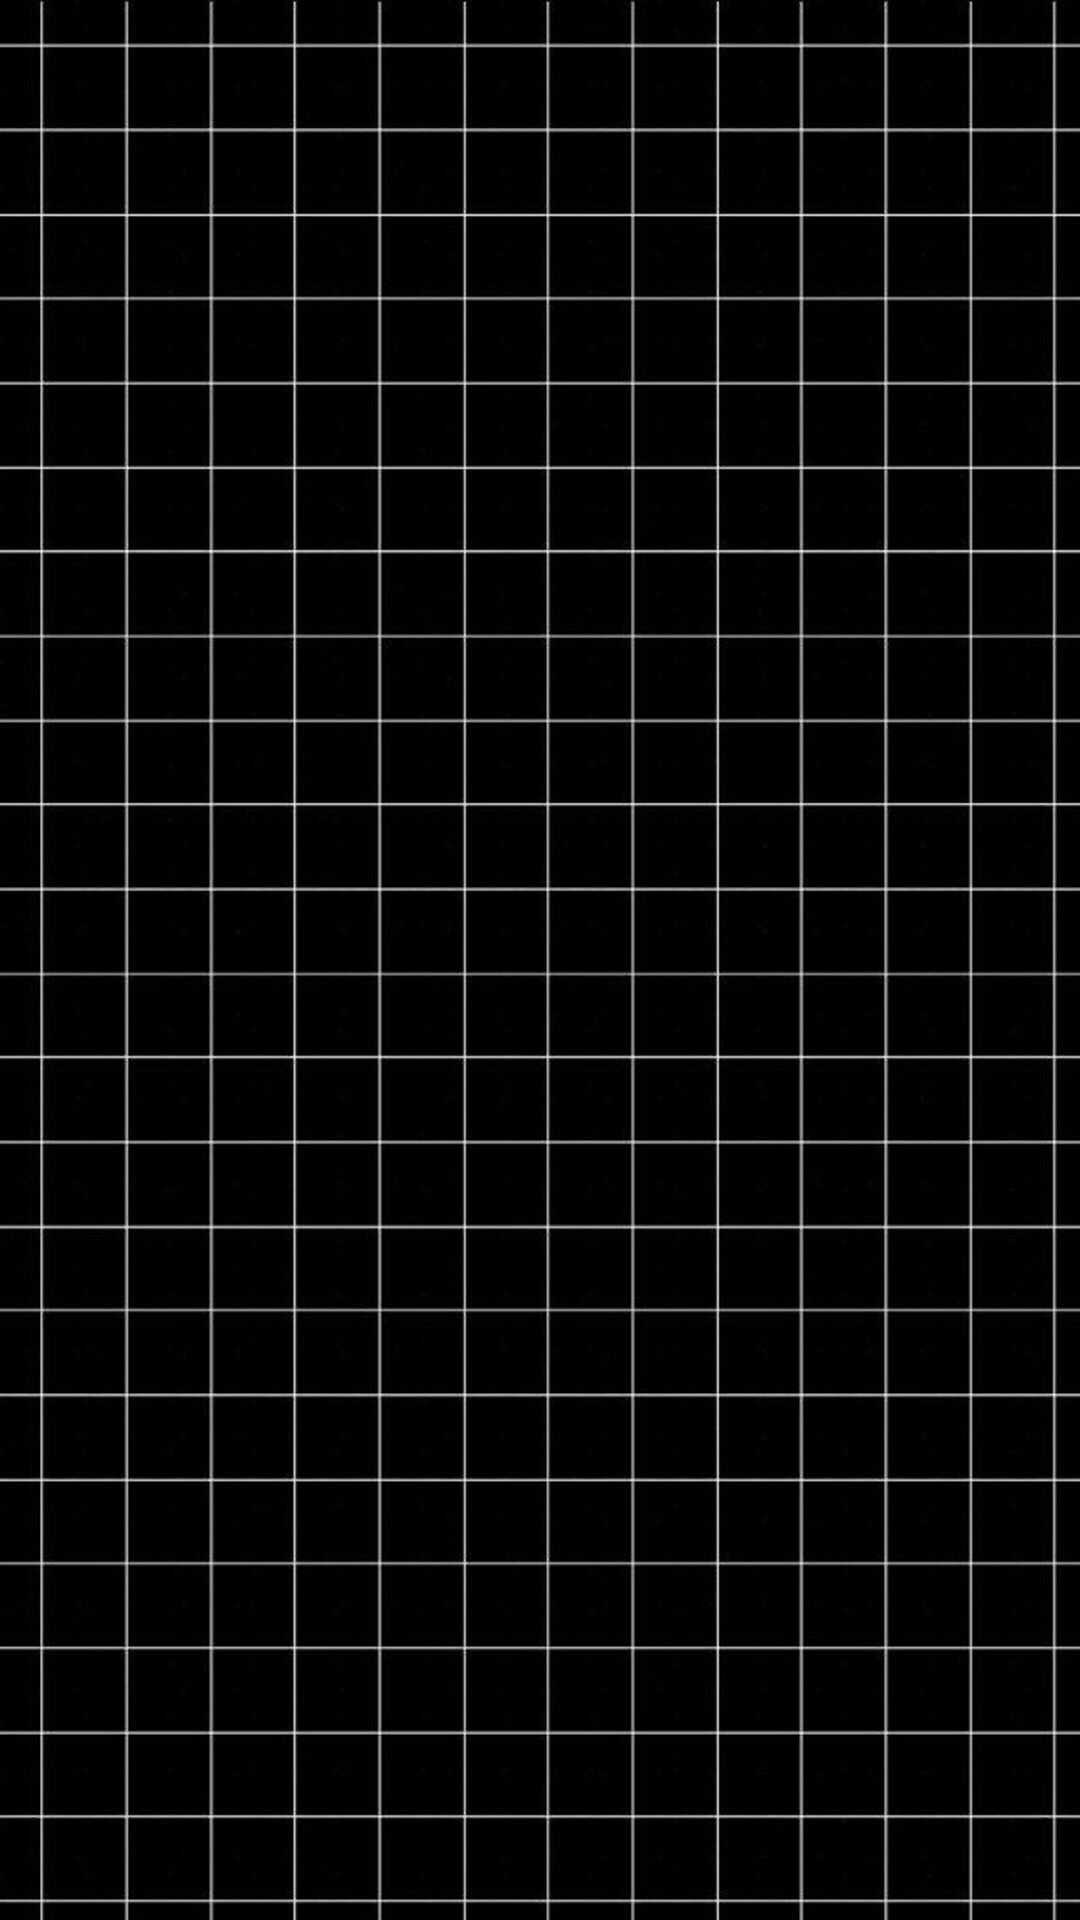 100 Grid wallpaper ideas grid wallpaper aesthetic 1080x1920